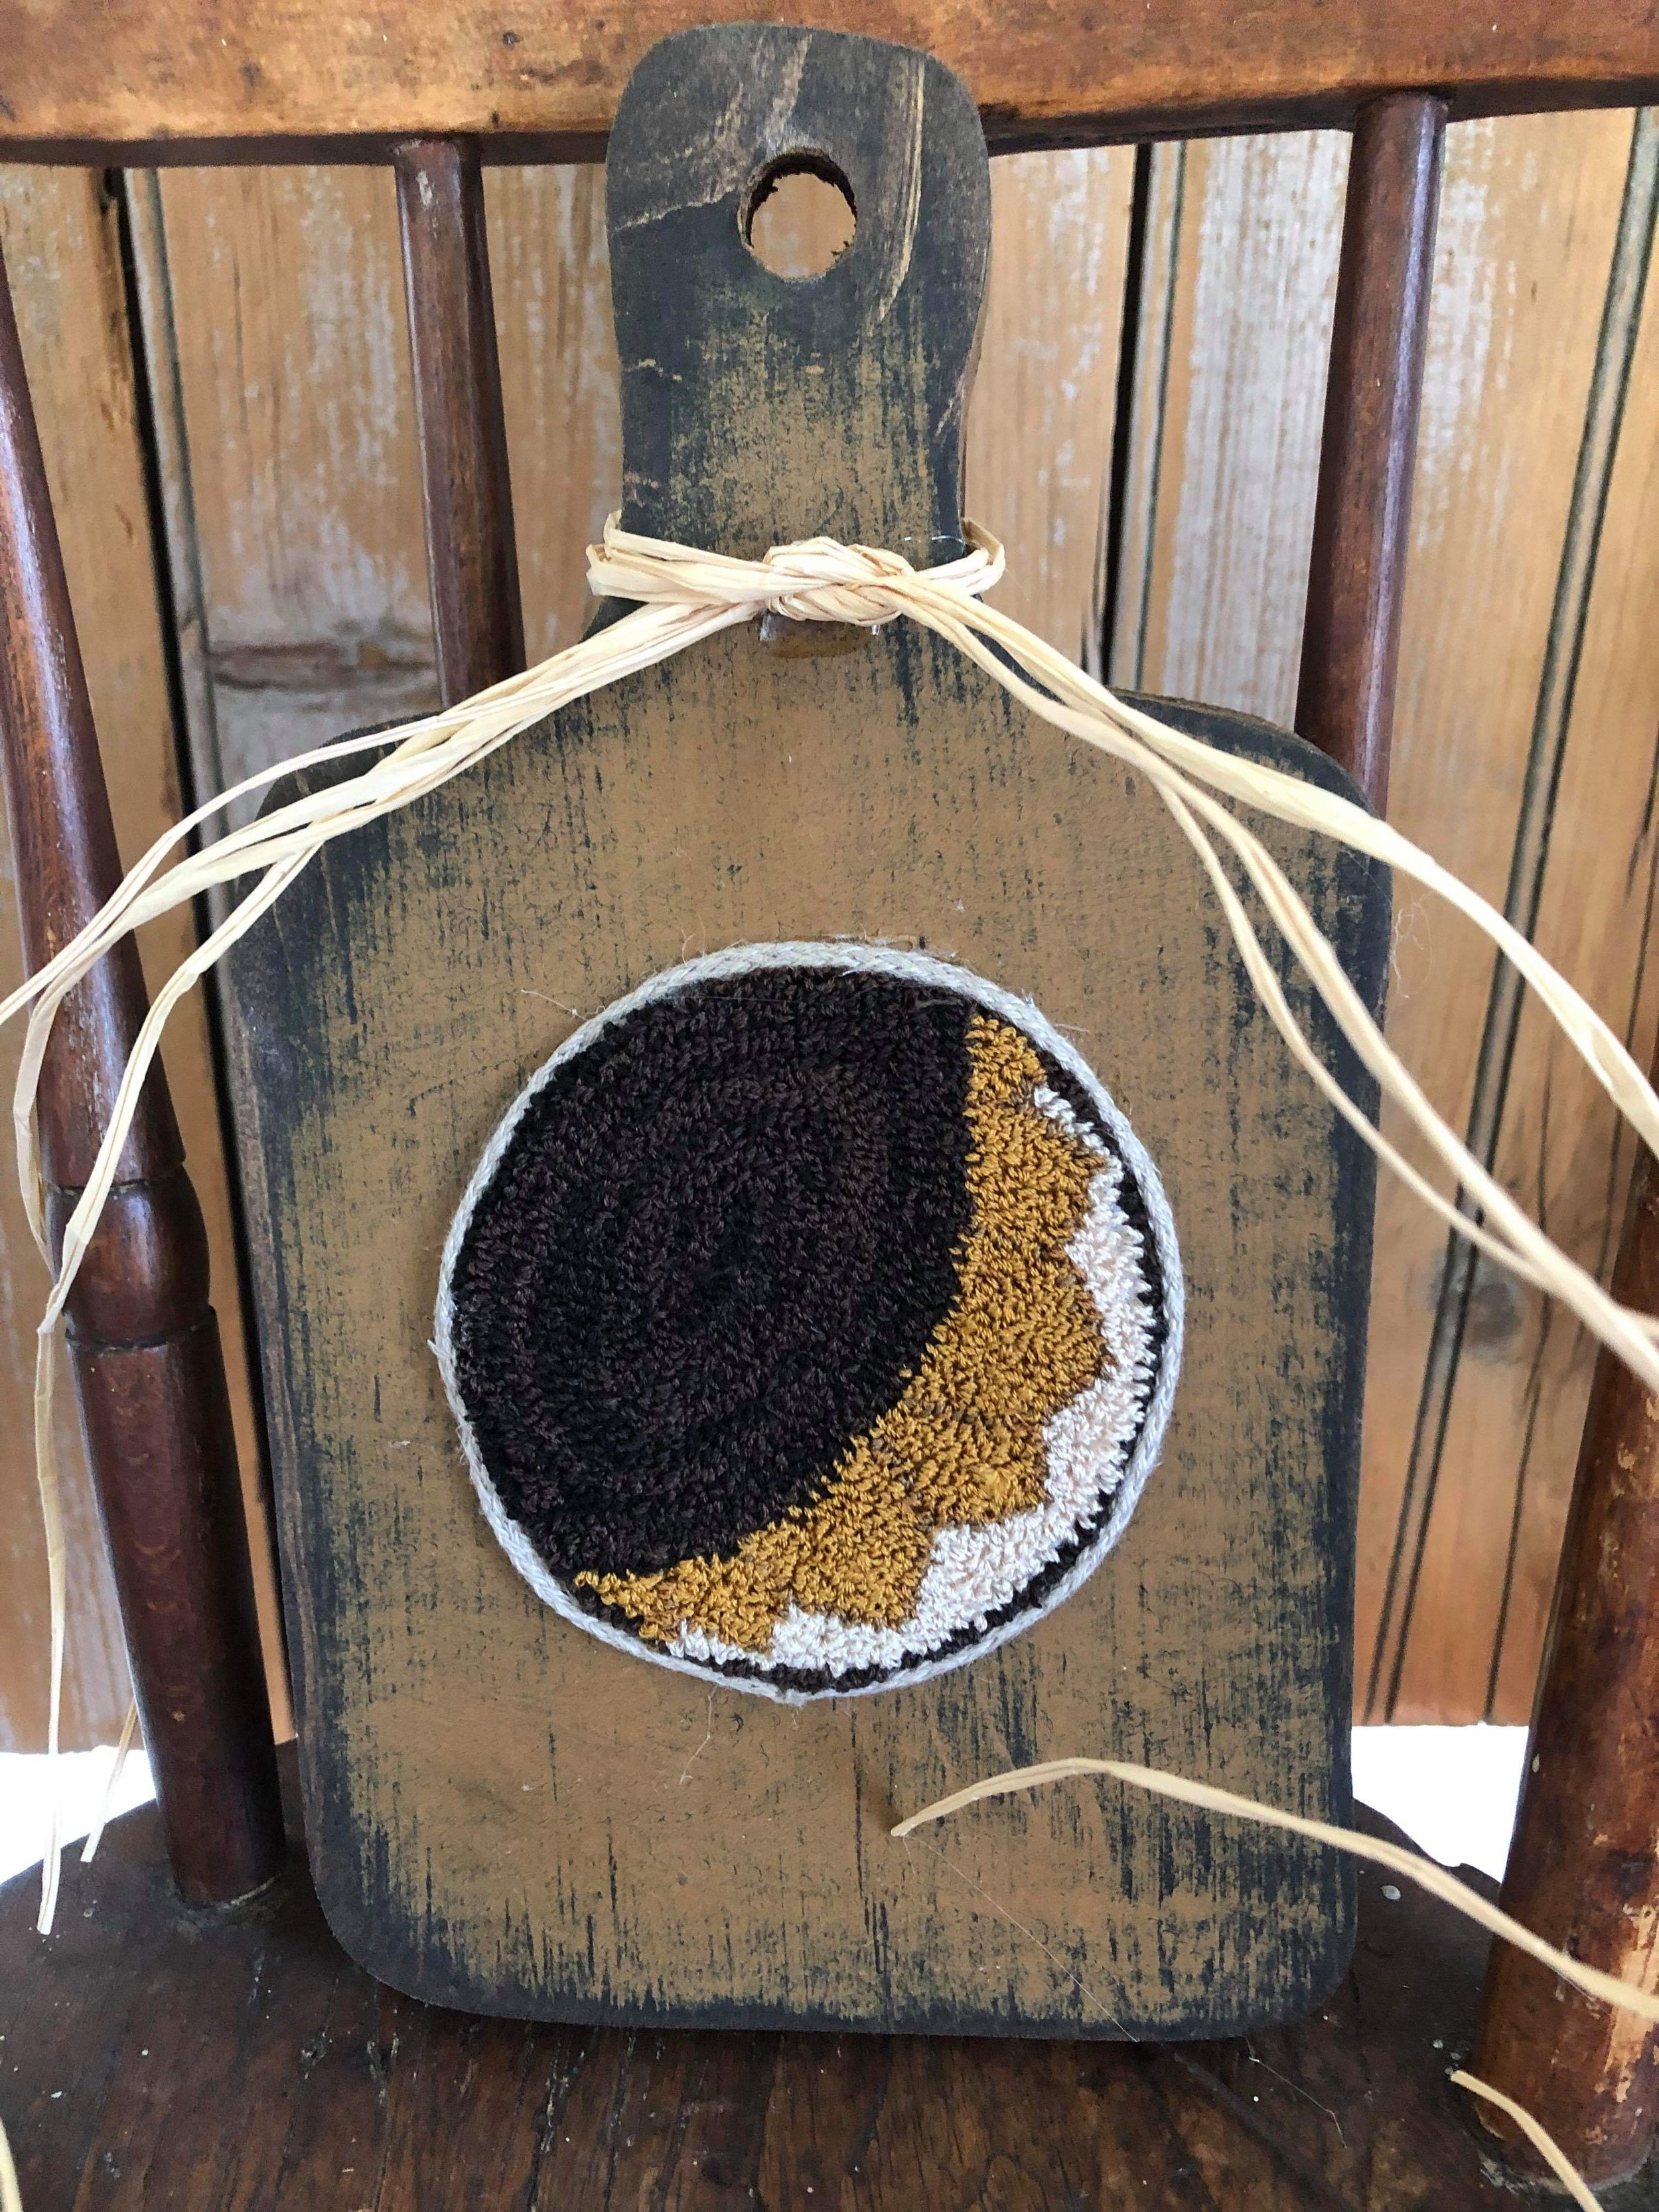 Beginner Punch Needle - Instructor: Leslie Attardo Luneau of Heartfully HomespunDate: Saturday, Sept. 7, 9:00-12:00 (Half Day Class)Date: Sunday, Sept. 8, 12:00-3:00 (Half Day Class)Cost: $95Max 6 spotsNo Experience Necessary.